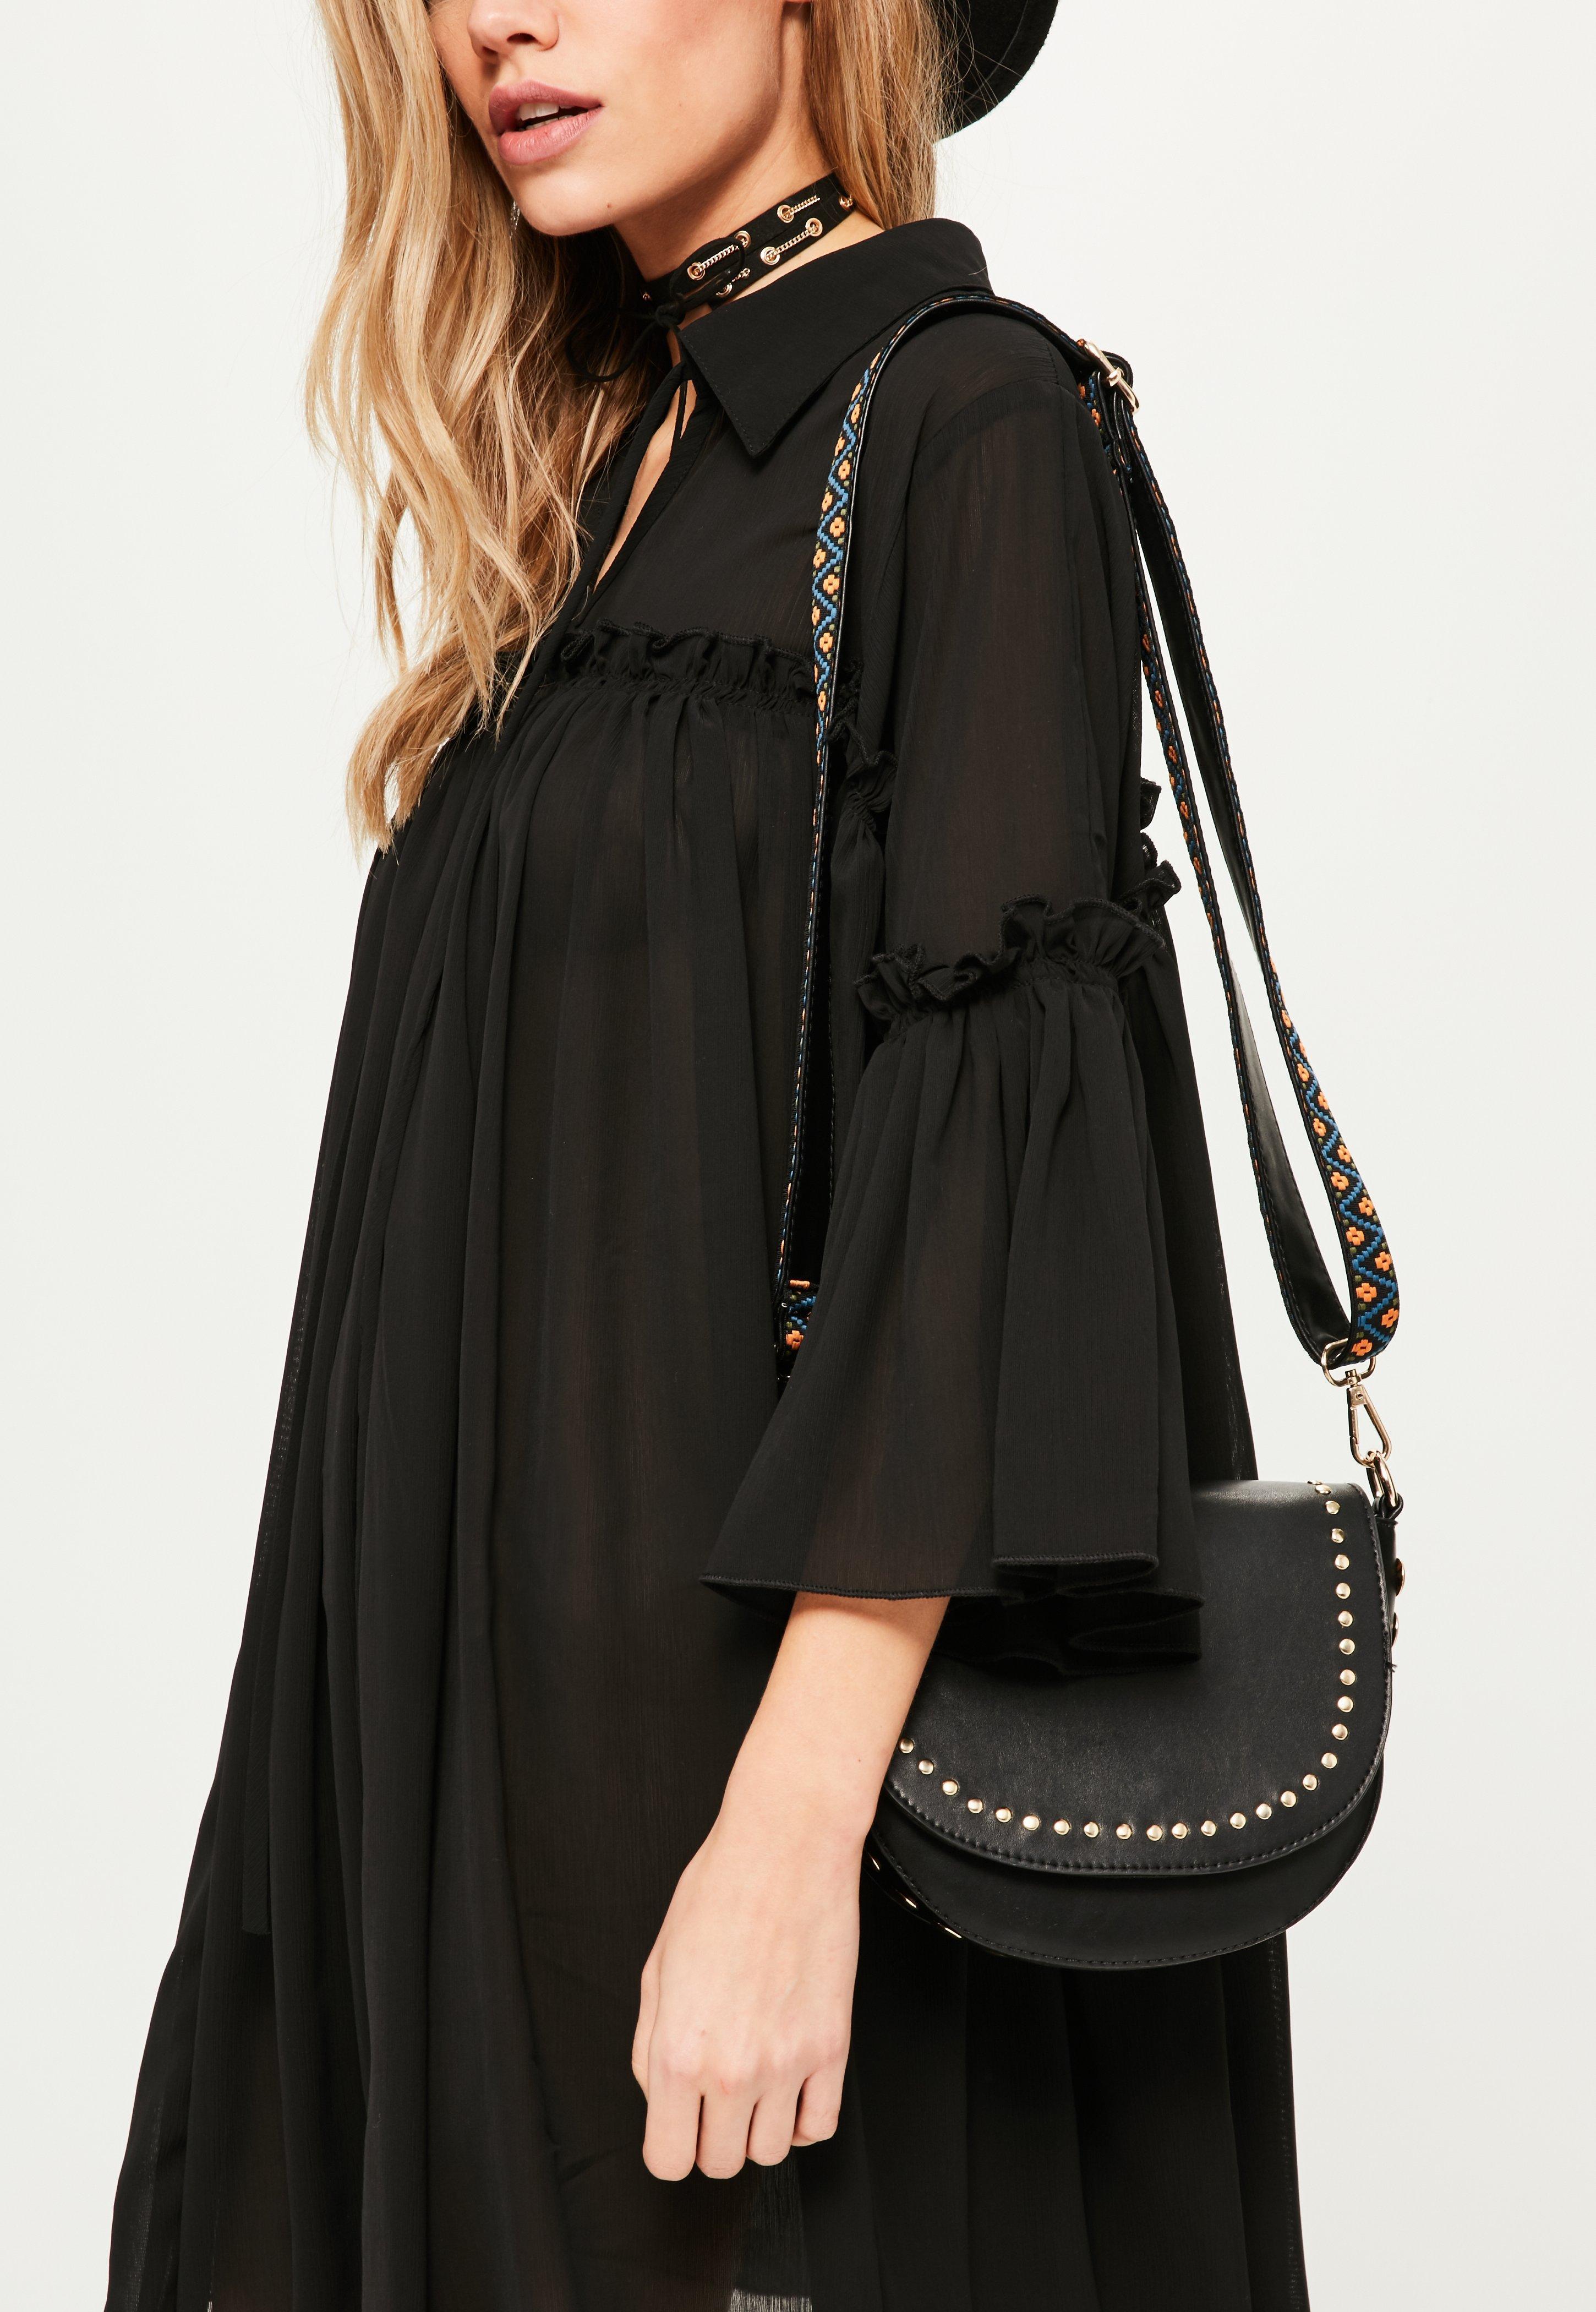 Missguided Black Studded Guitar Strap Cross Body Bag